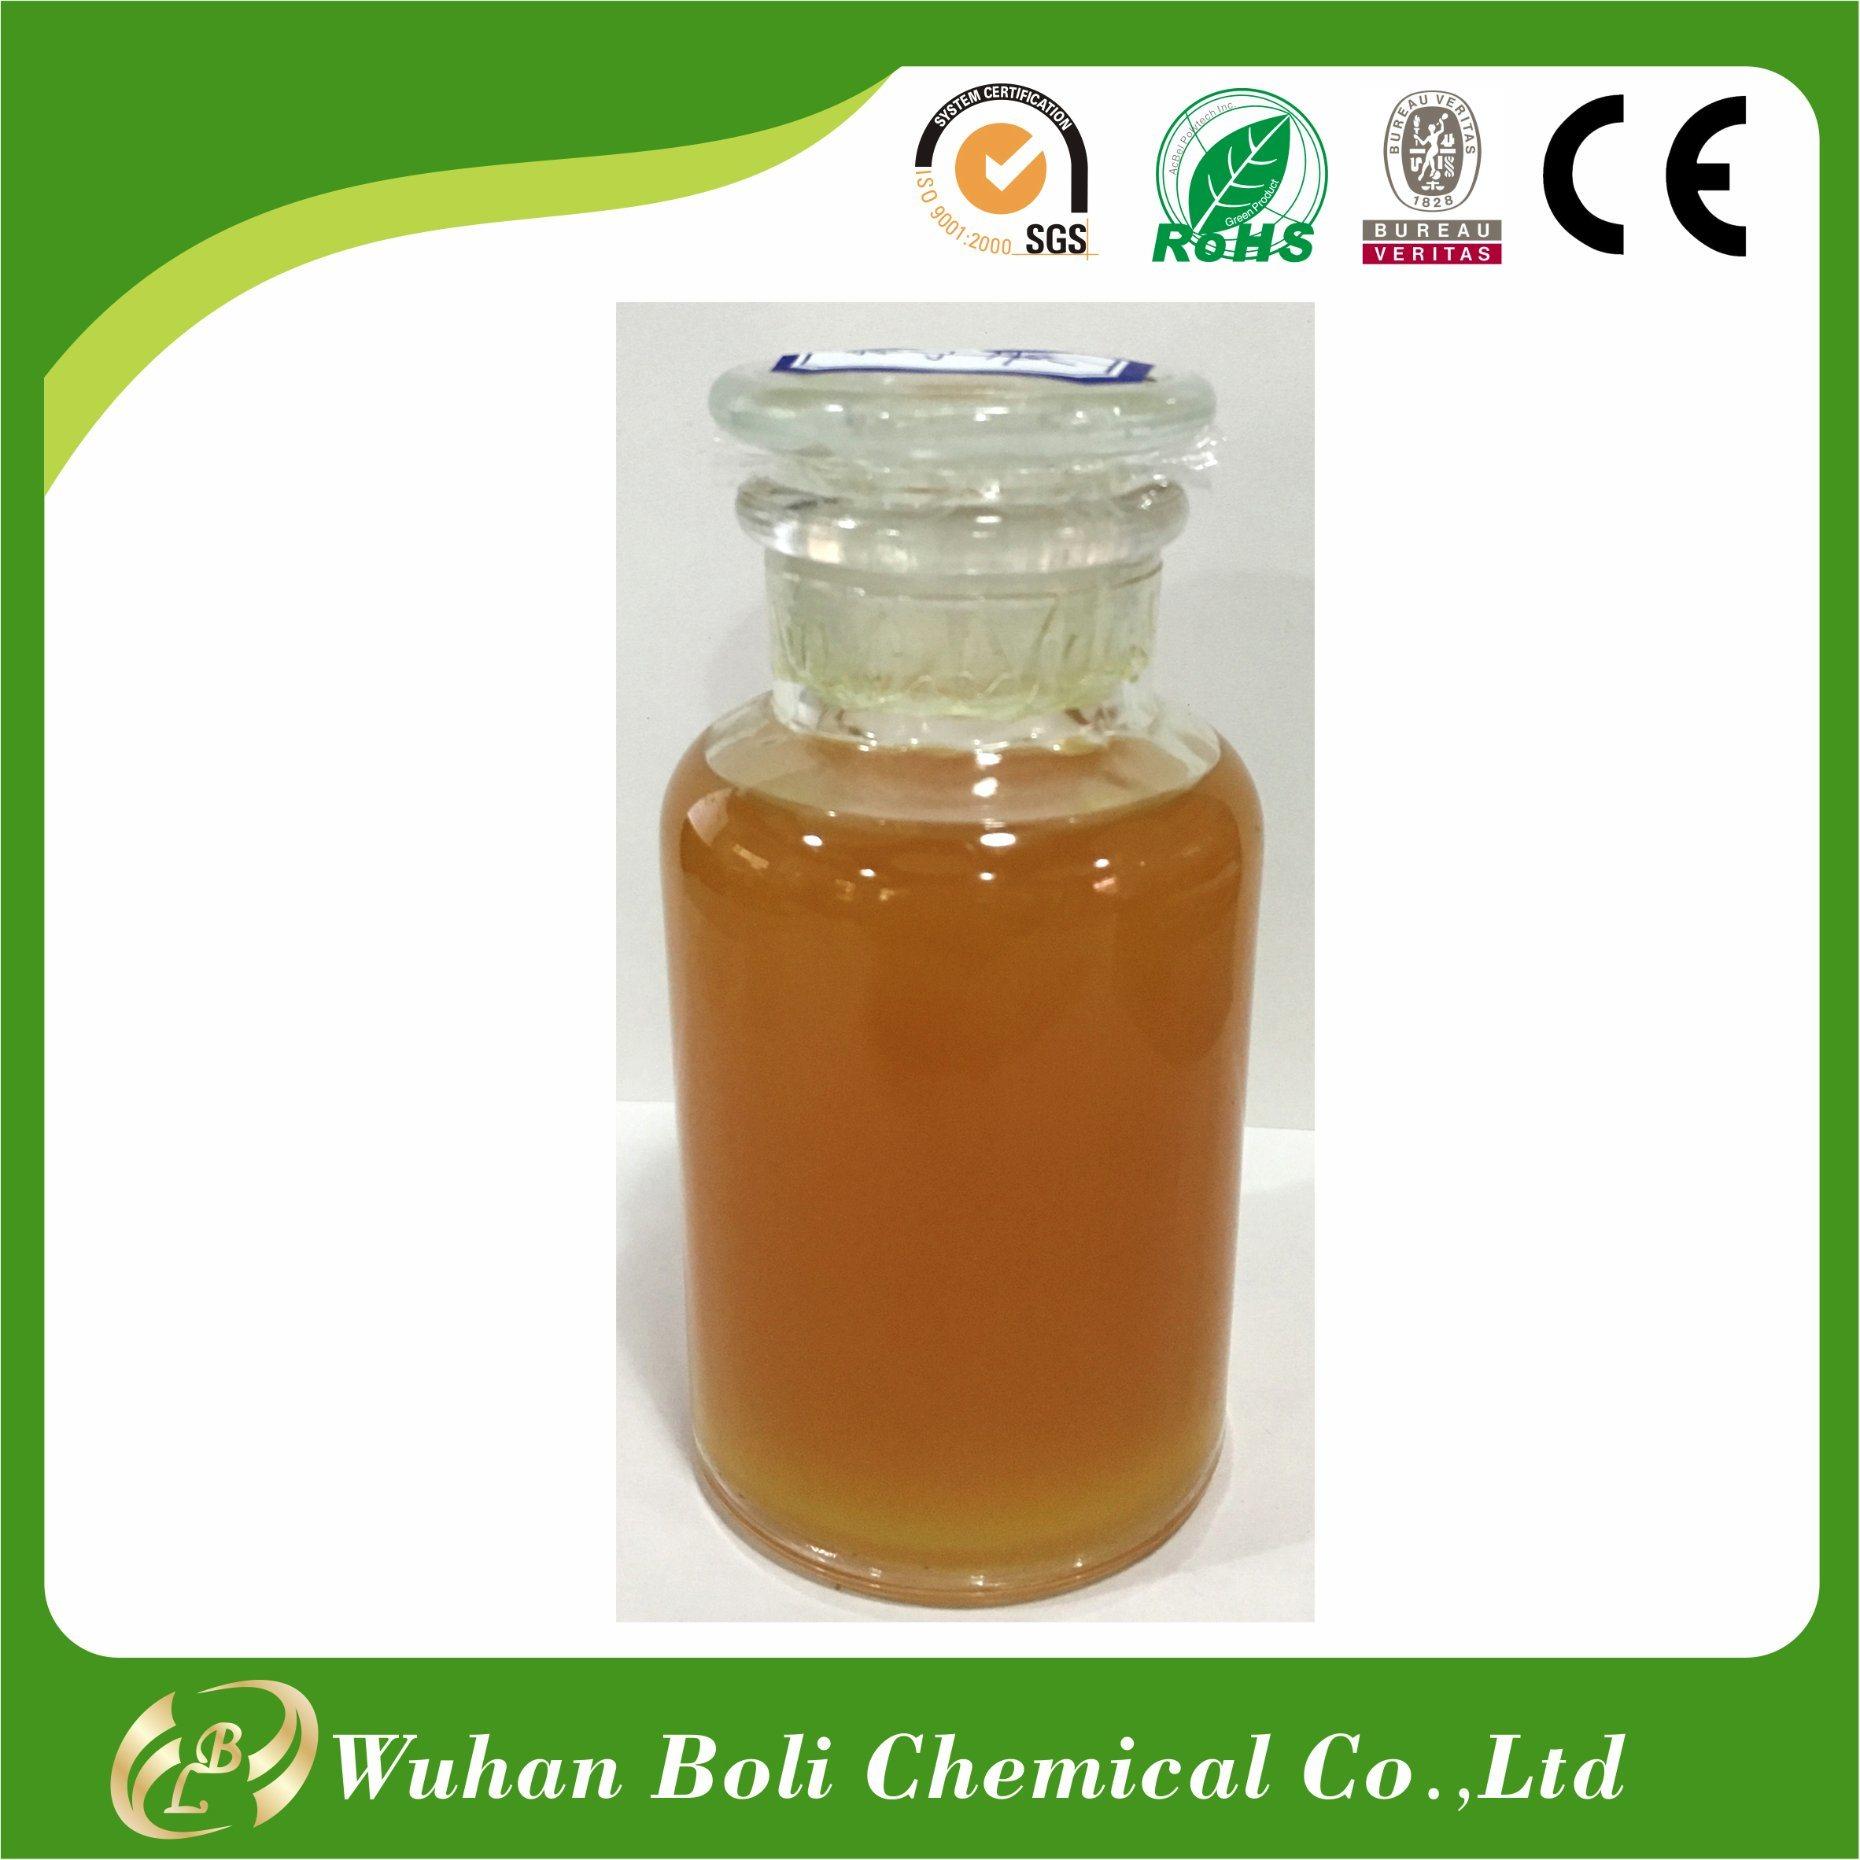 High Viscosity Neoprene Glue